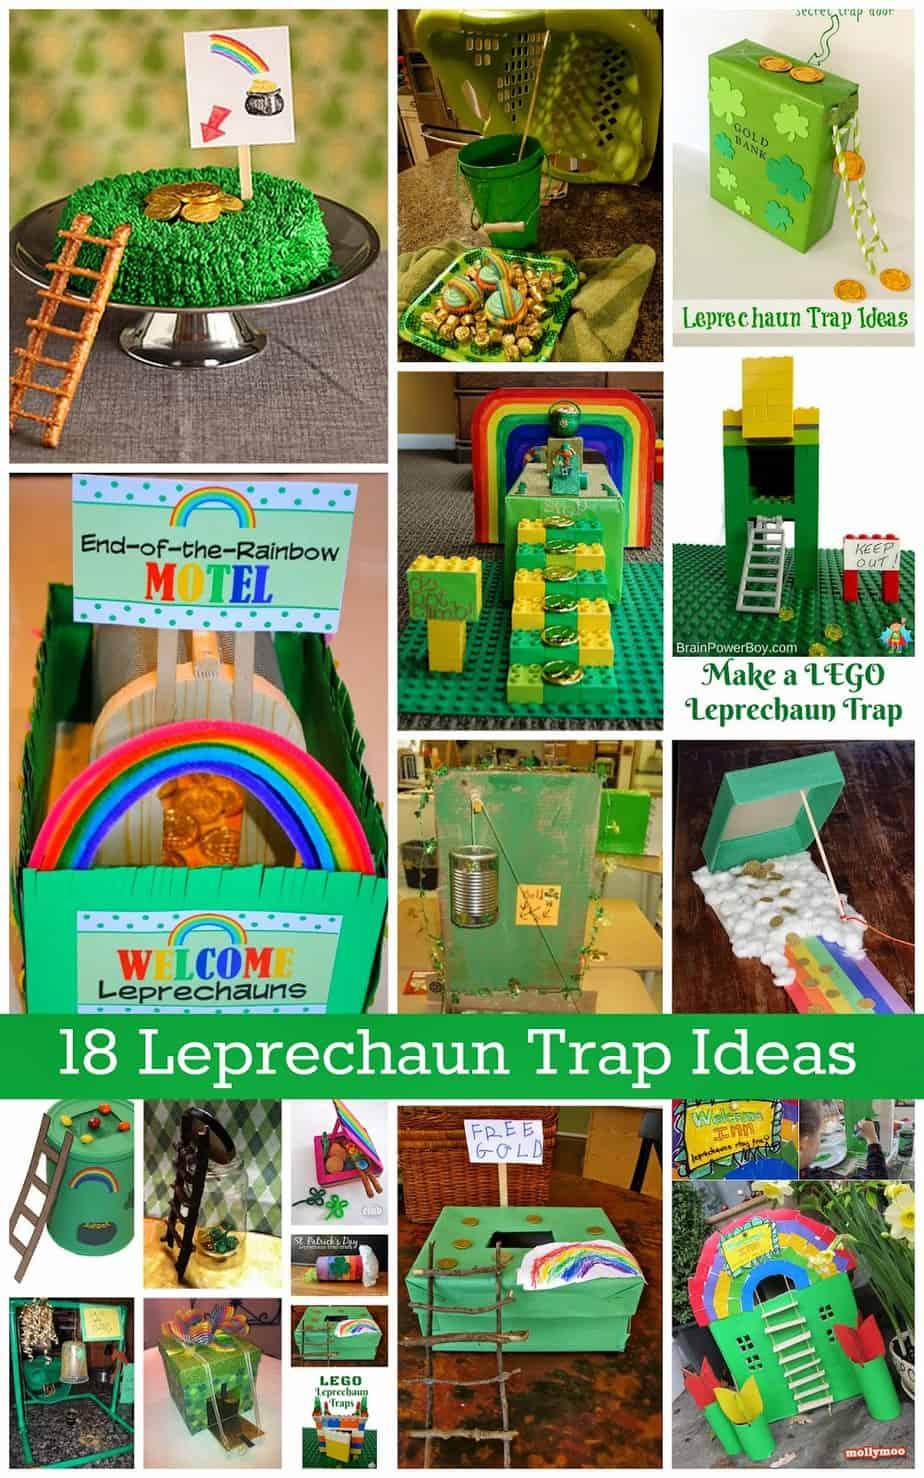 18 Leprechaun Trap Ideas Housewife Eclectic